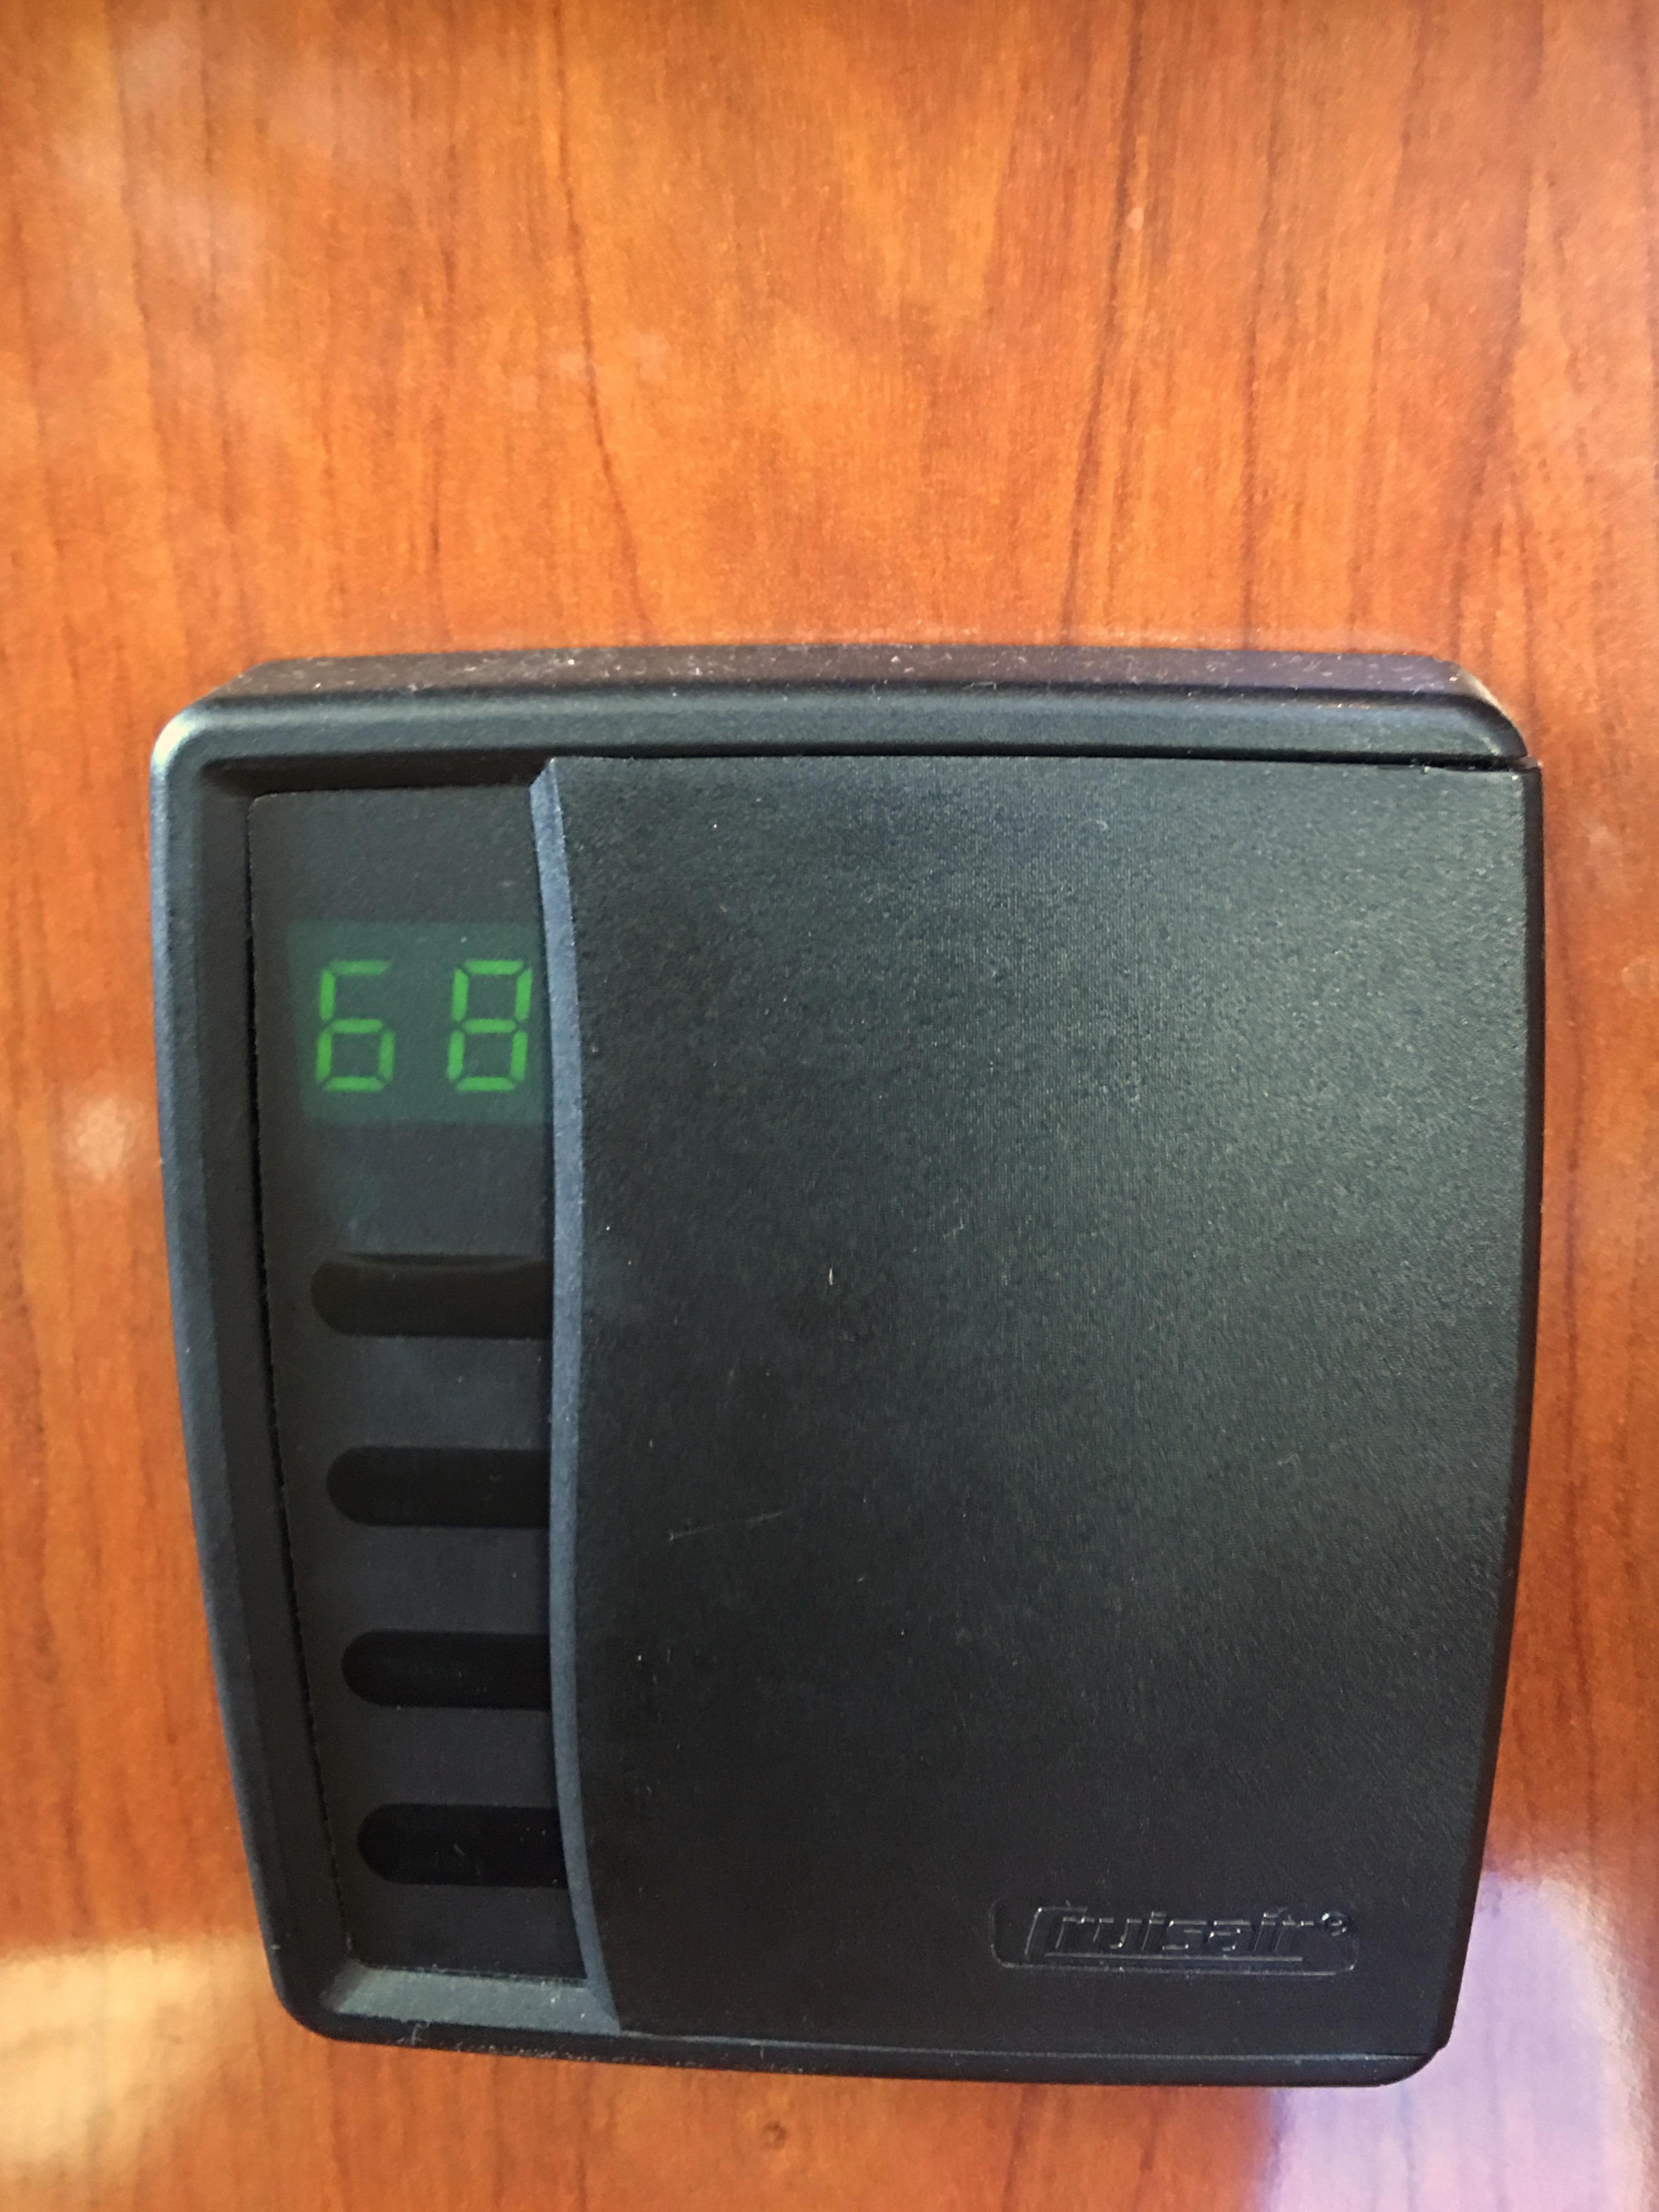 28 of 53